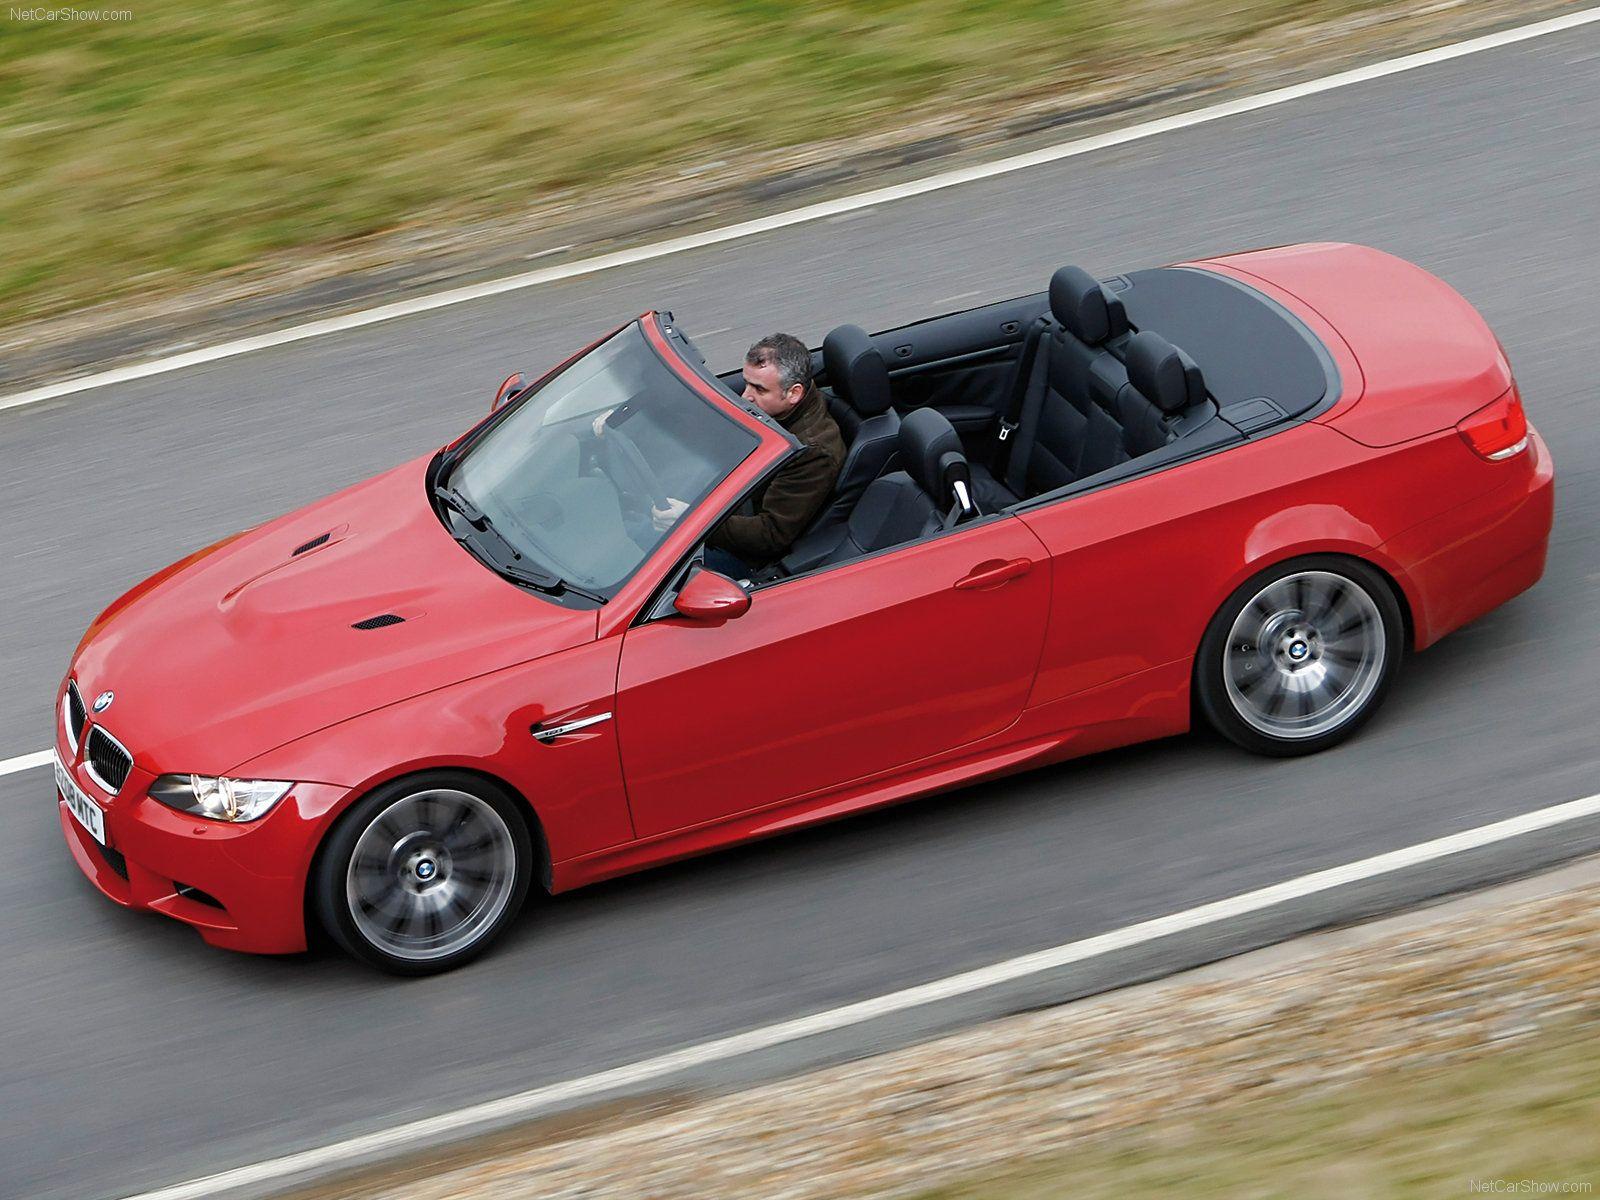 2011 BMW M3 Convertible | BMW Cabriolets | Pinterest | BMW M3, 2011 ...